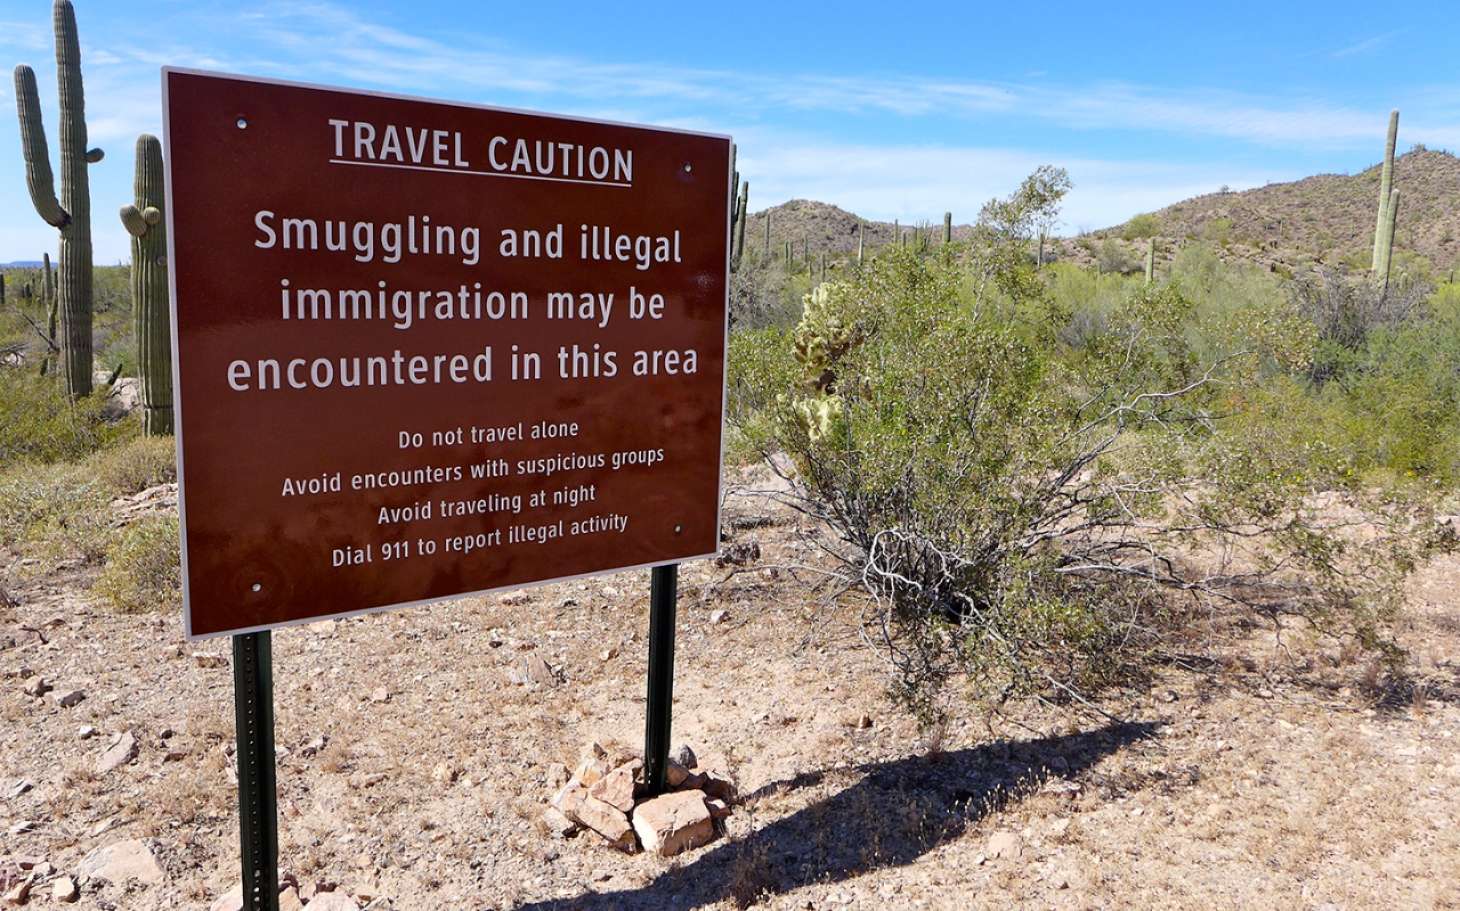 Arizona border park once deemed dangerous reopens al jazeera america publicscrutiny Image collections